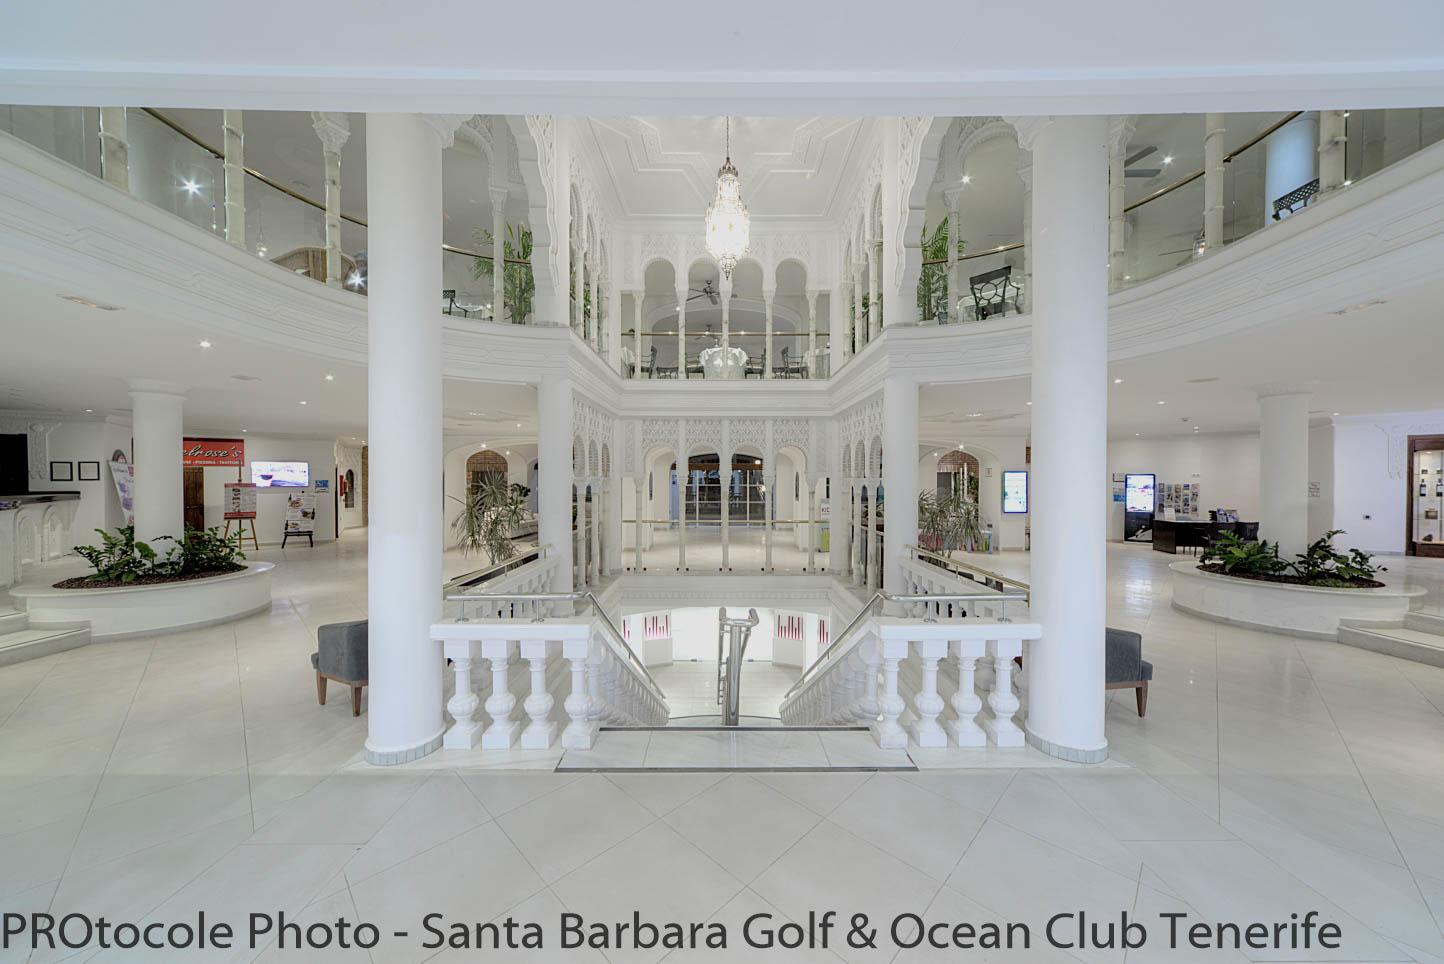 Tenerife Hôtel Santa Barbara Golf and Ocean Club